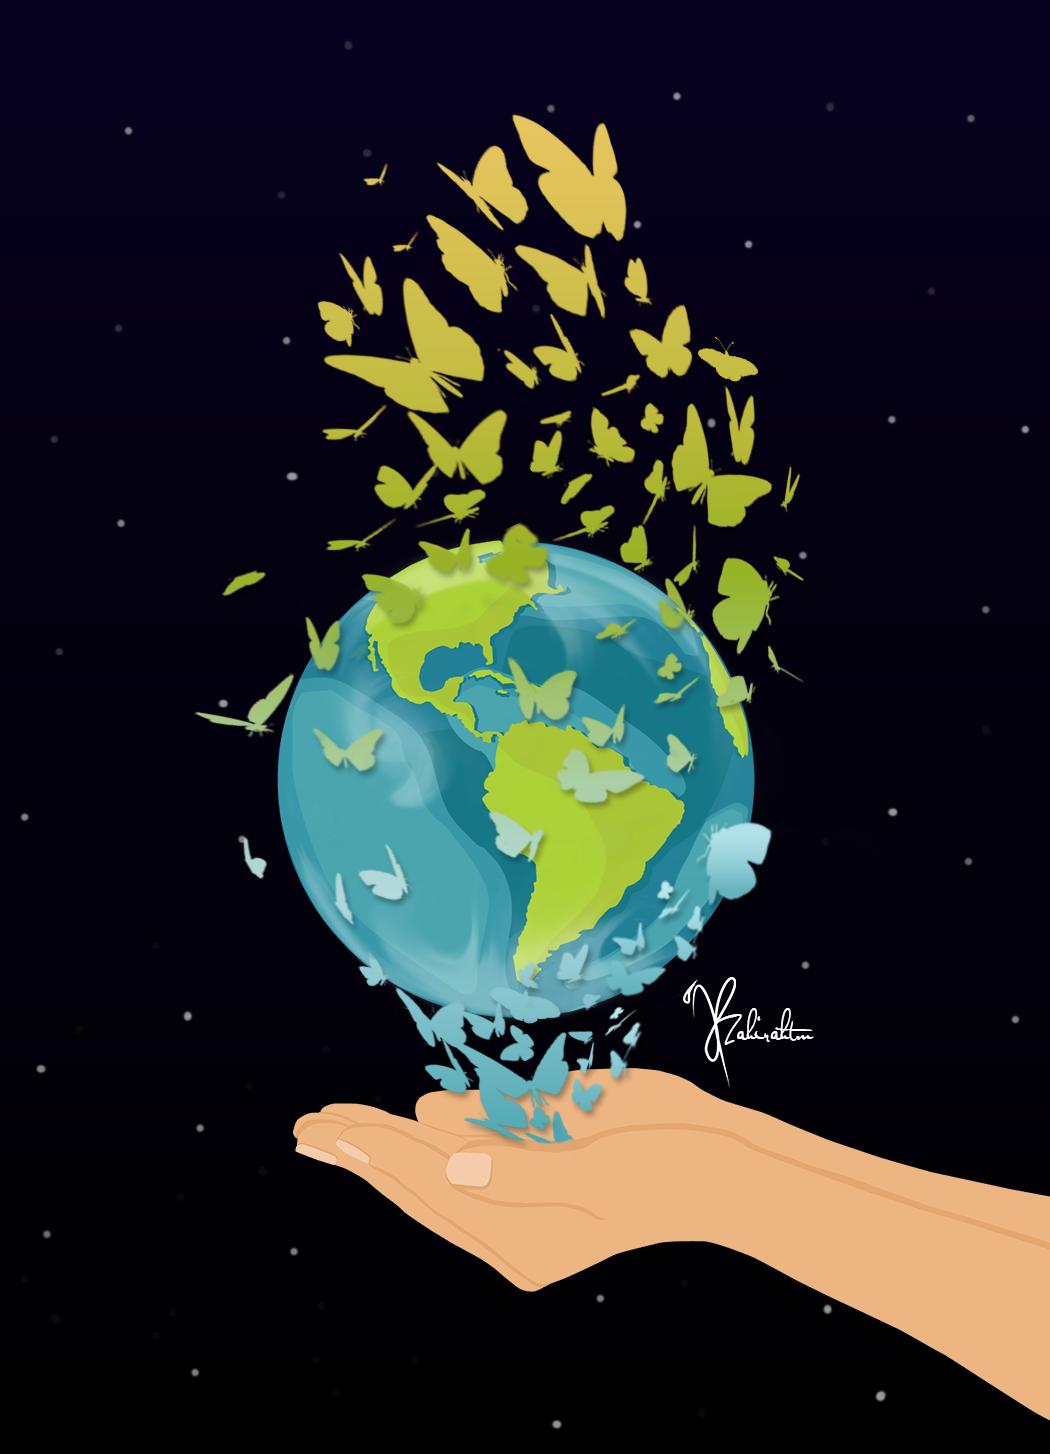 Earth day poster #earthday #saveearth #nature #vectorposter #vectorart #artwork #adobeillustrator